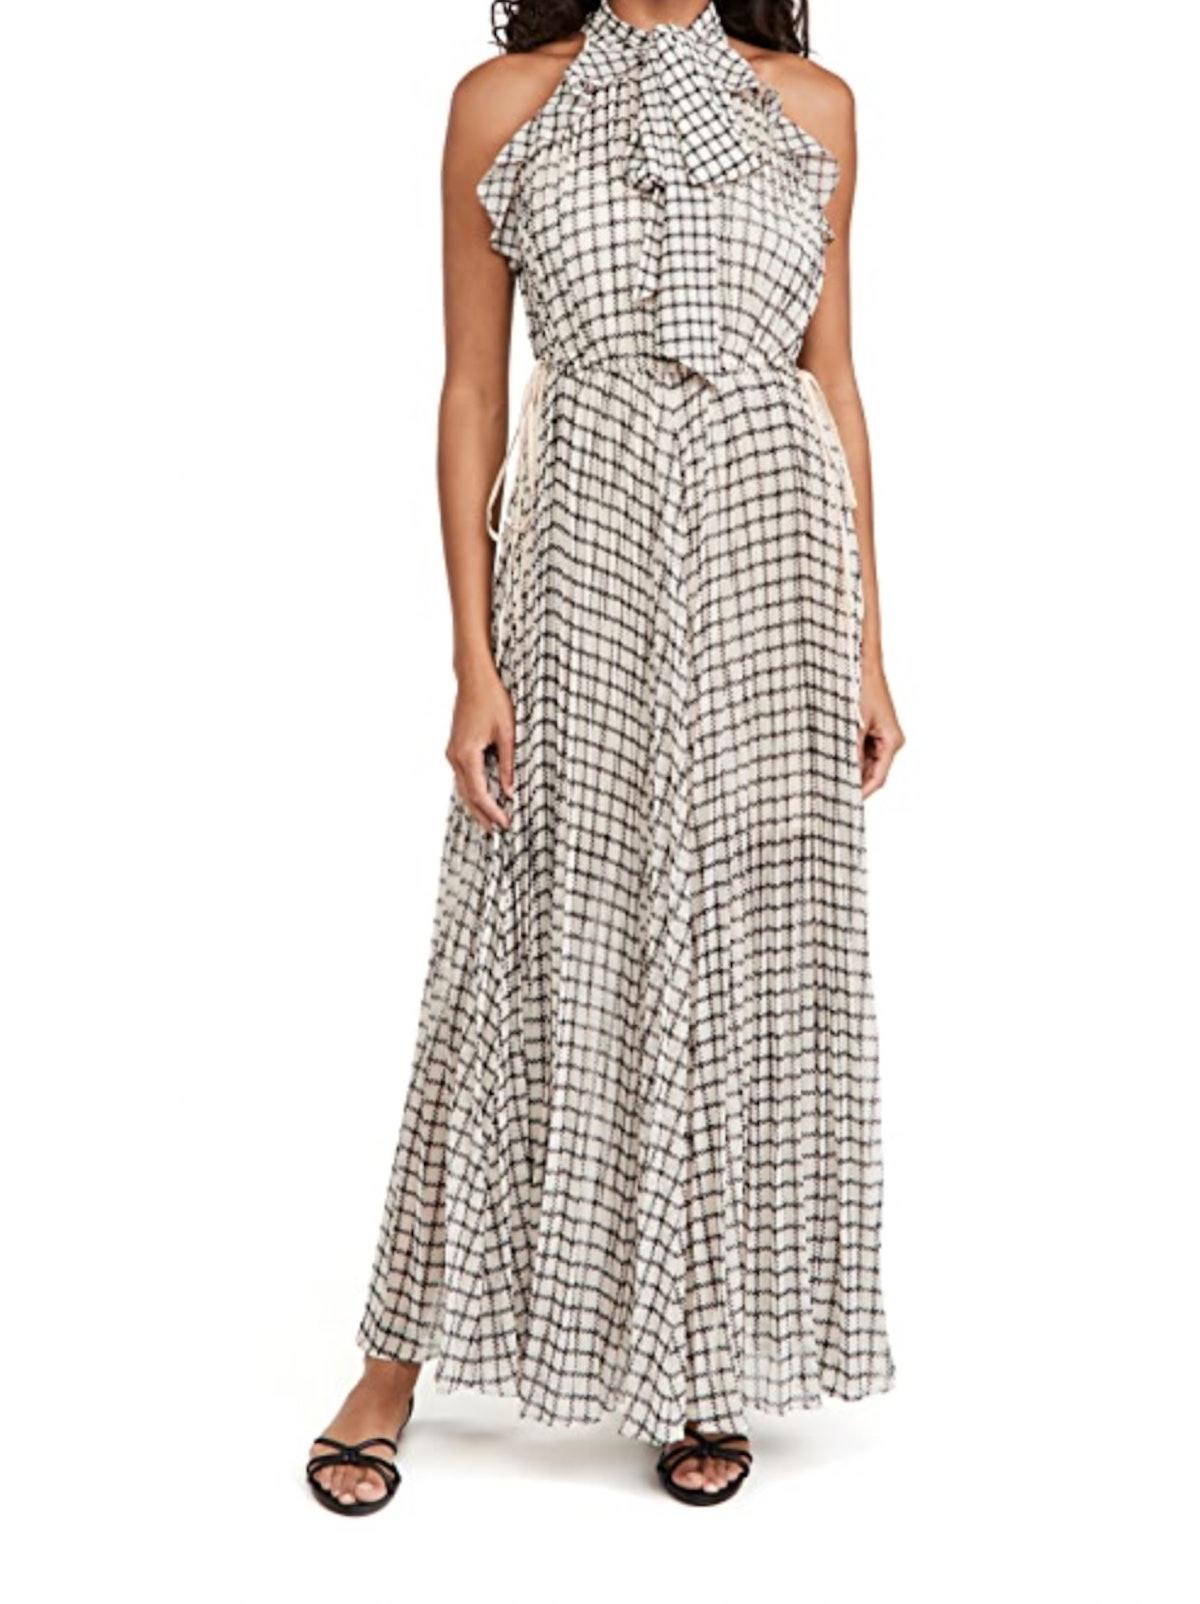 Monochrome Check Maxi Dress